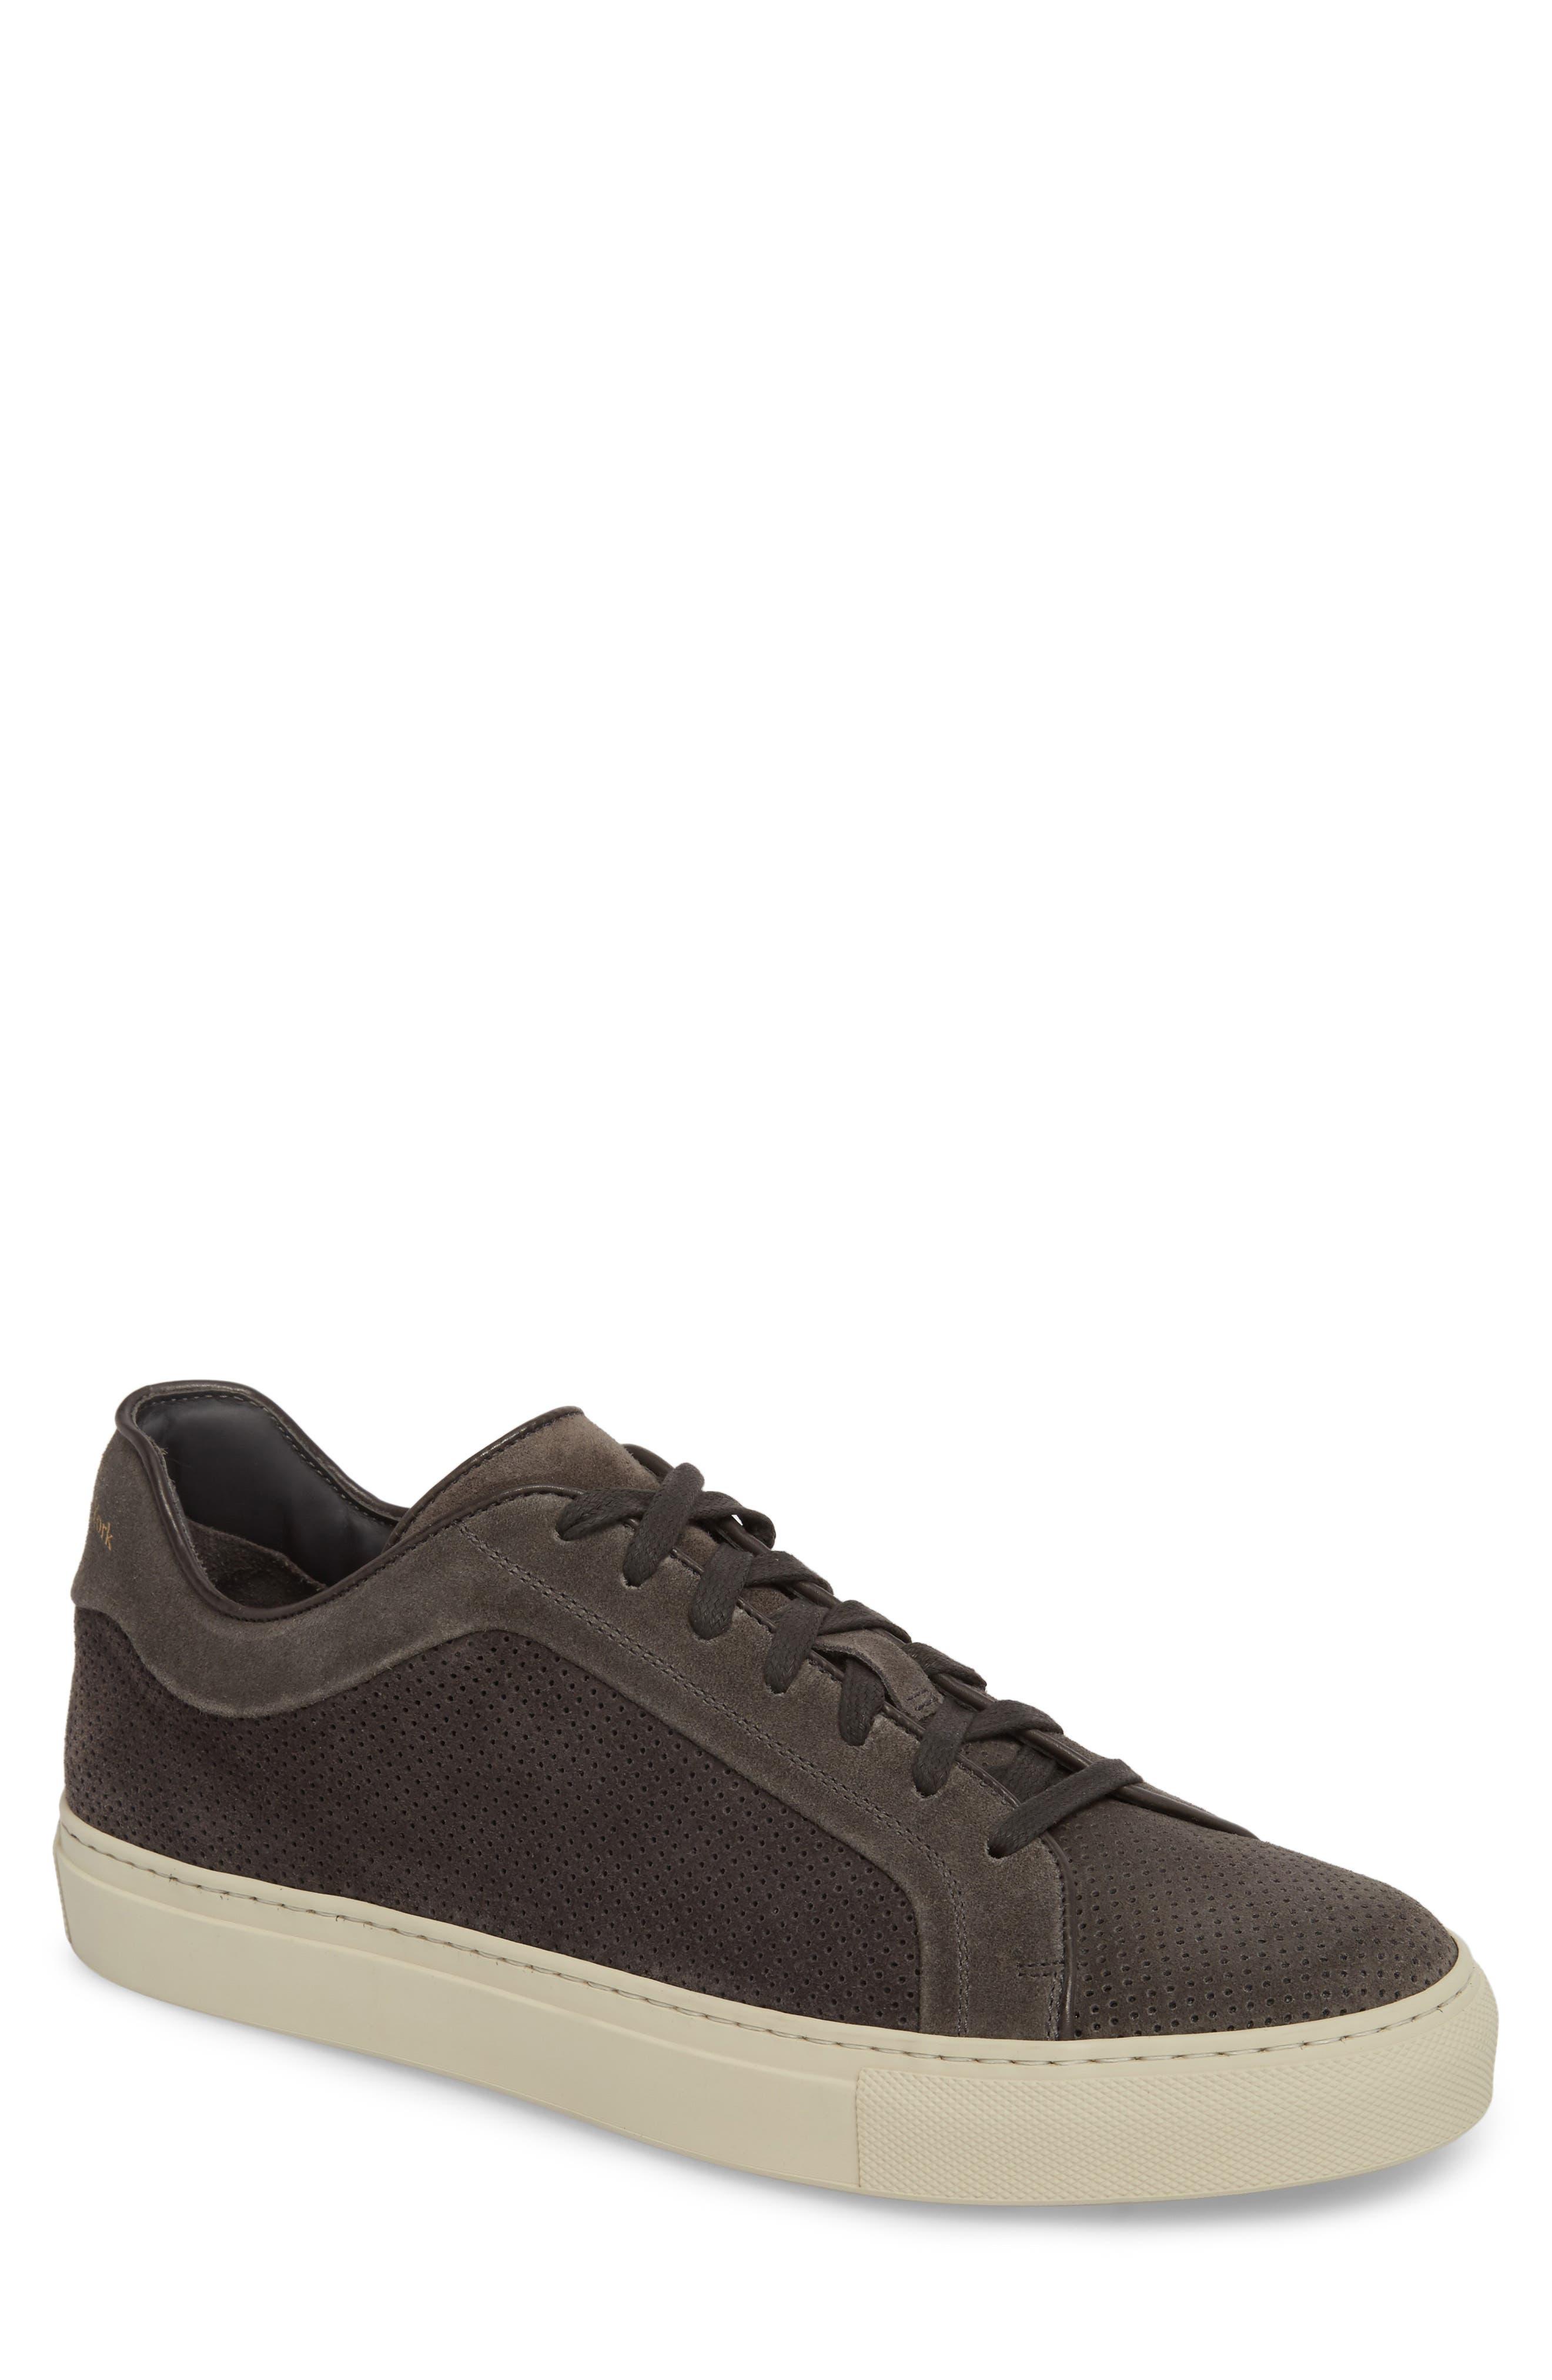 Hendrick Perforated Sneaker,                         Main,                         color,